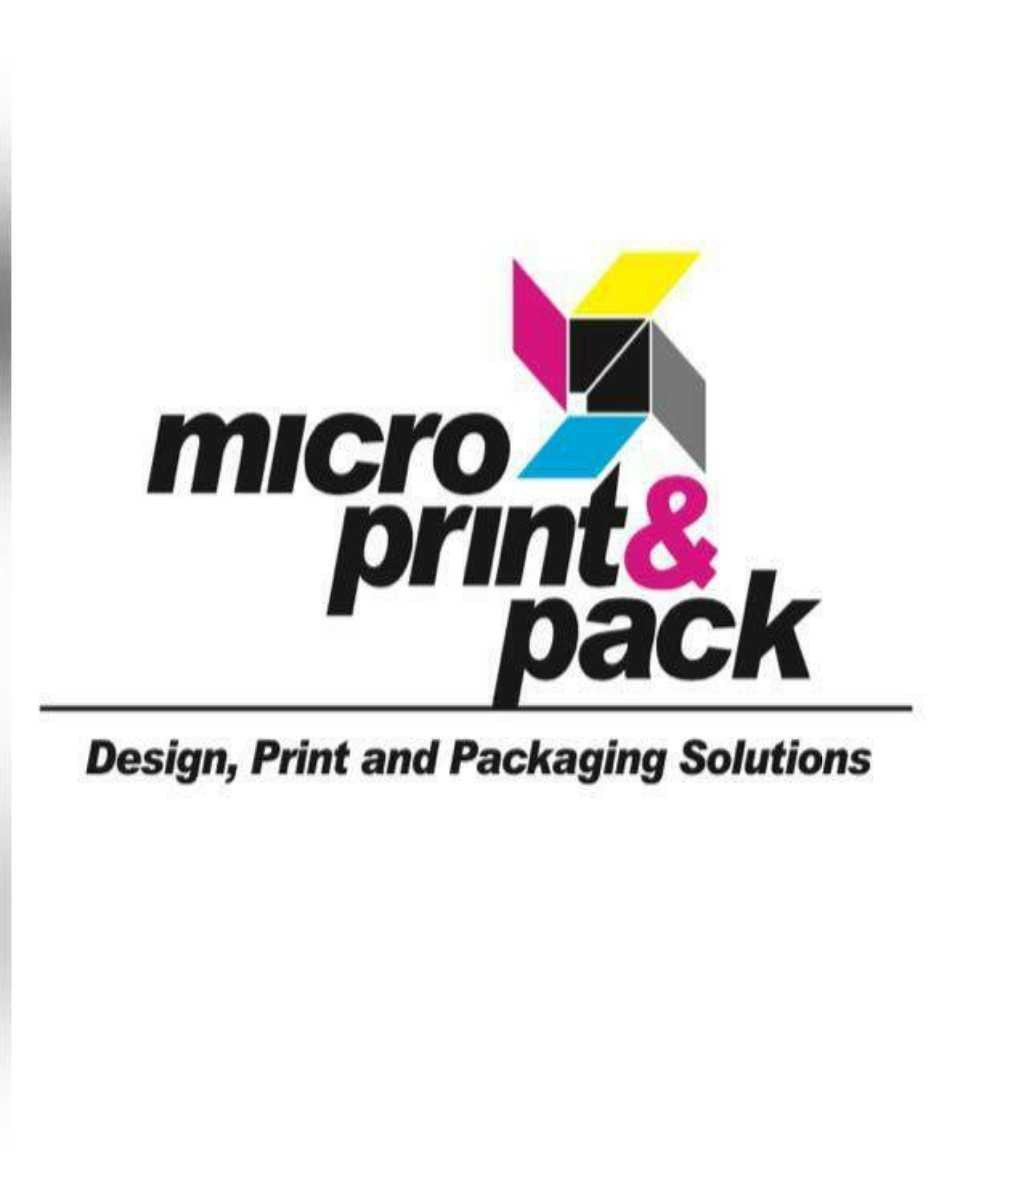 MICRO PRINT & PACK